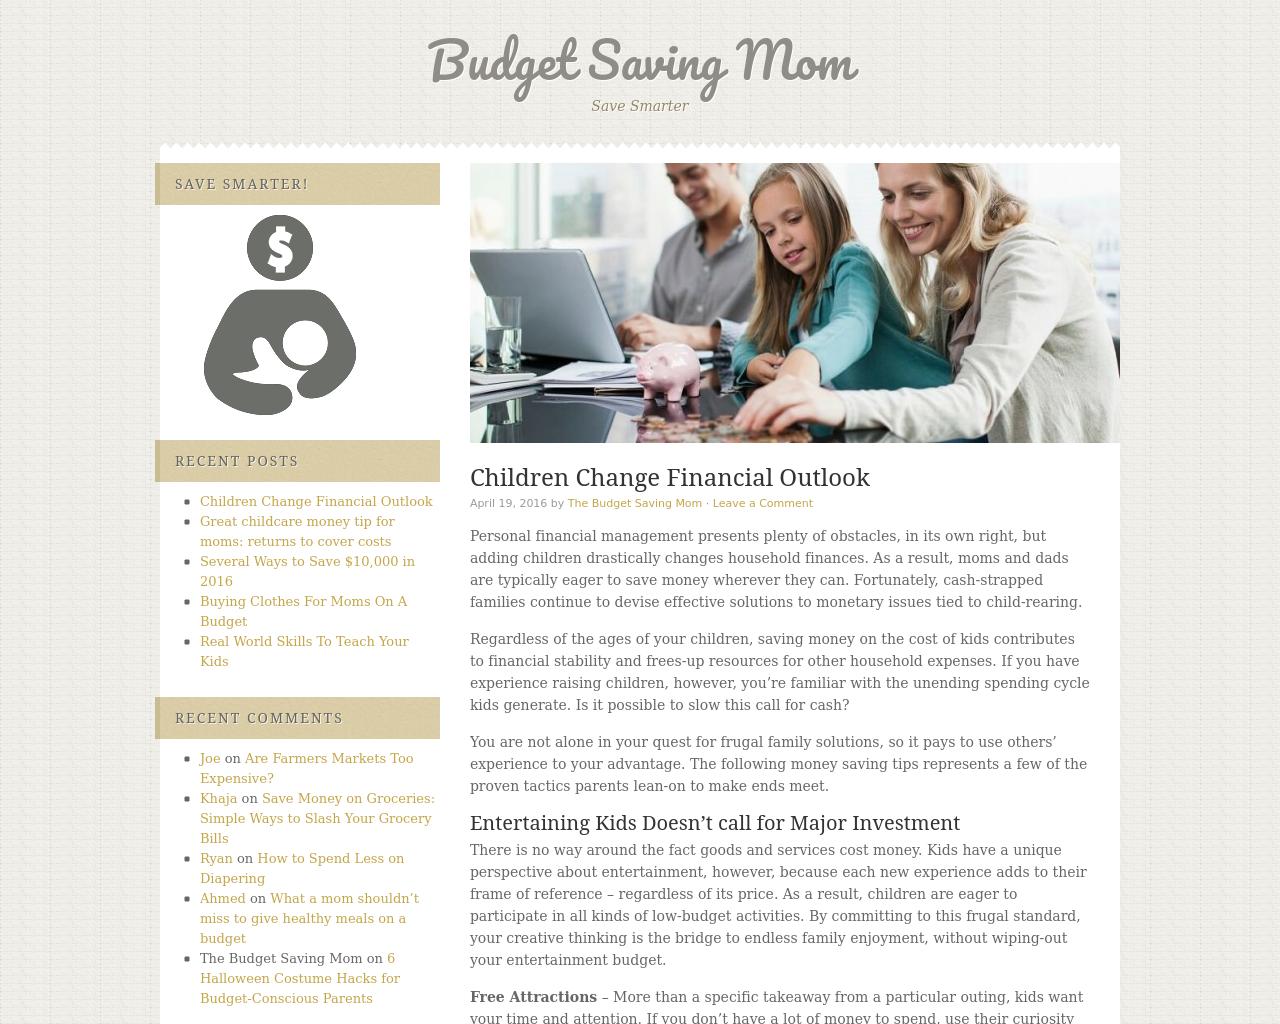 Budget-Saving-Mom-Advertising-Reviews-Pricing